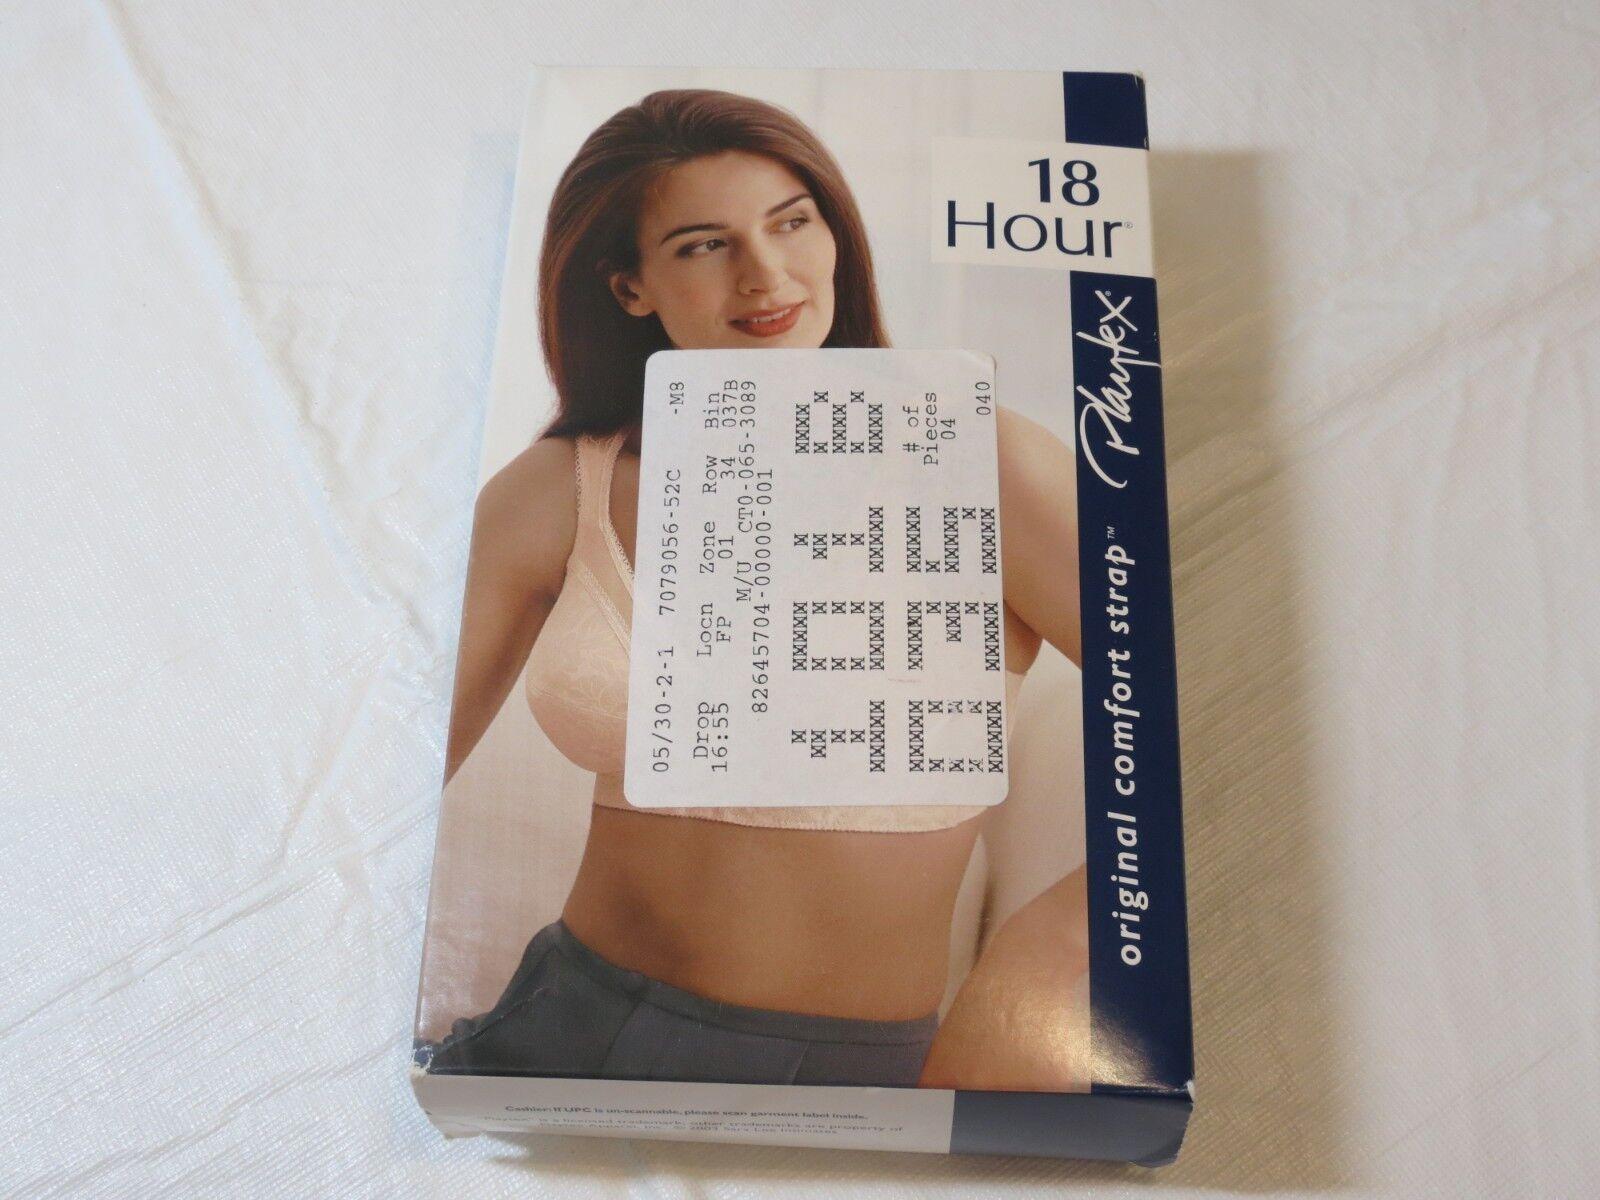 Original Comfort Strap Playtex 18 Hour Bra 4693 Soft Cup 52C Beige Womens NOS